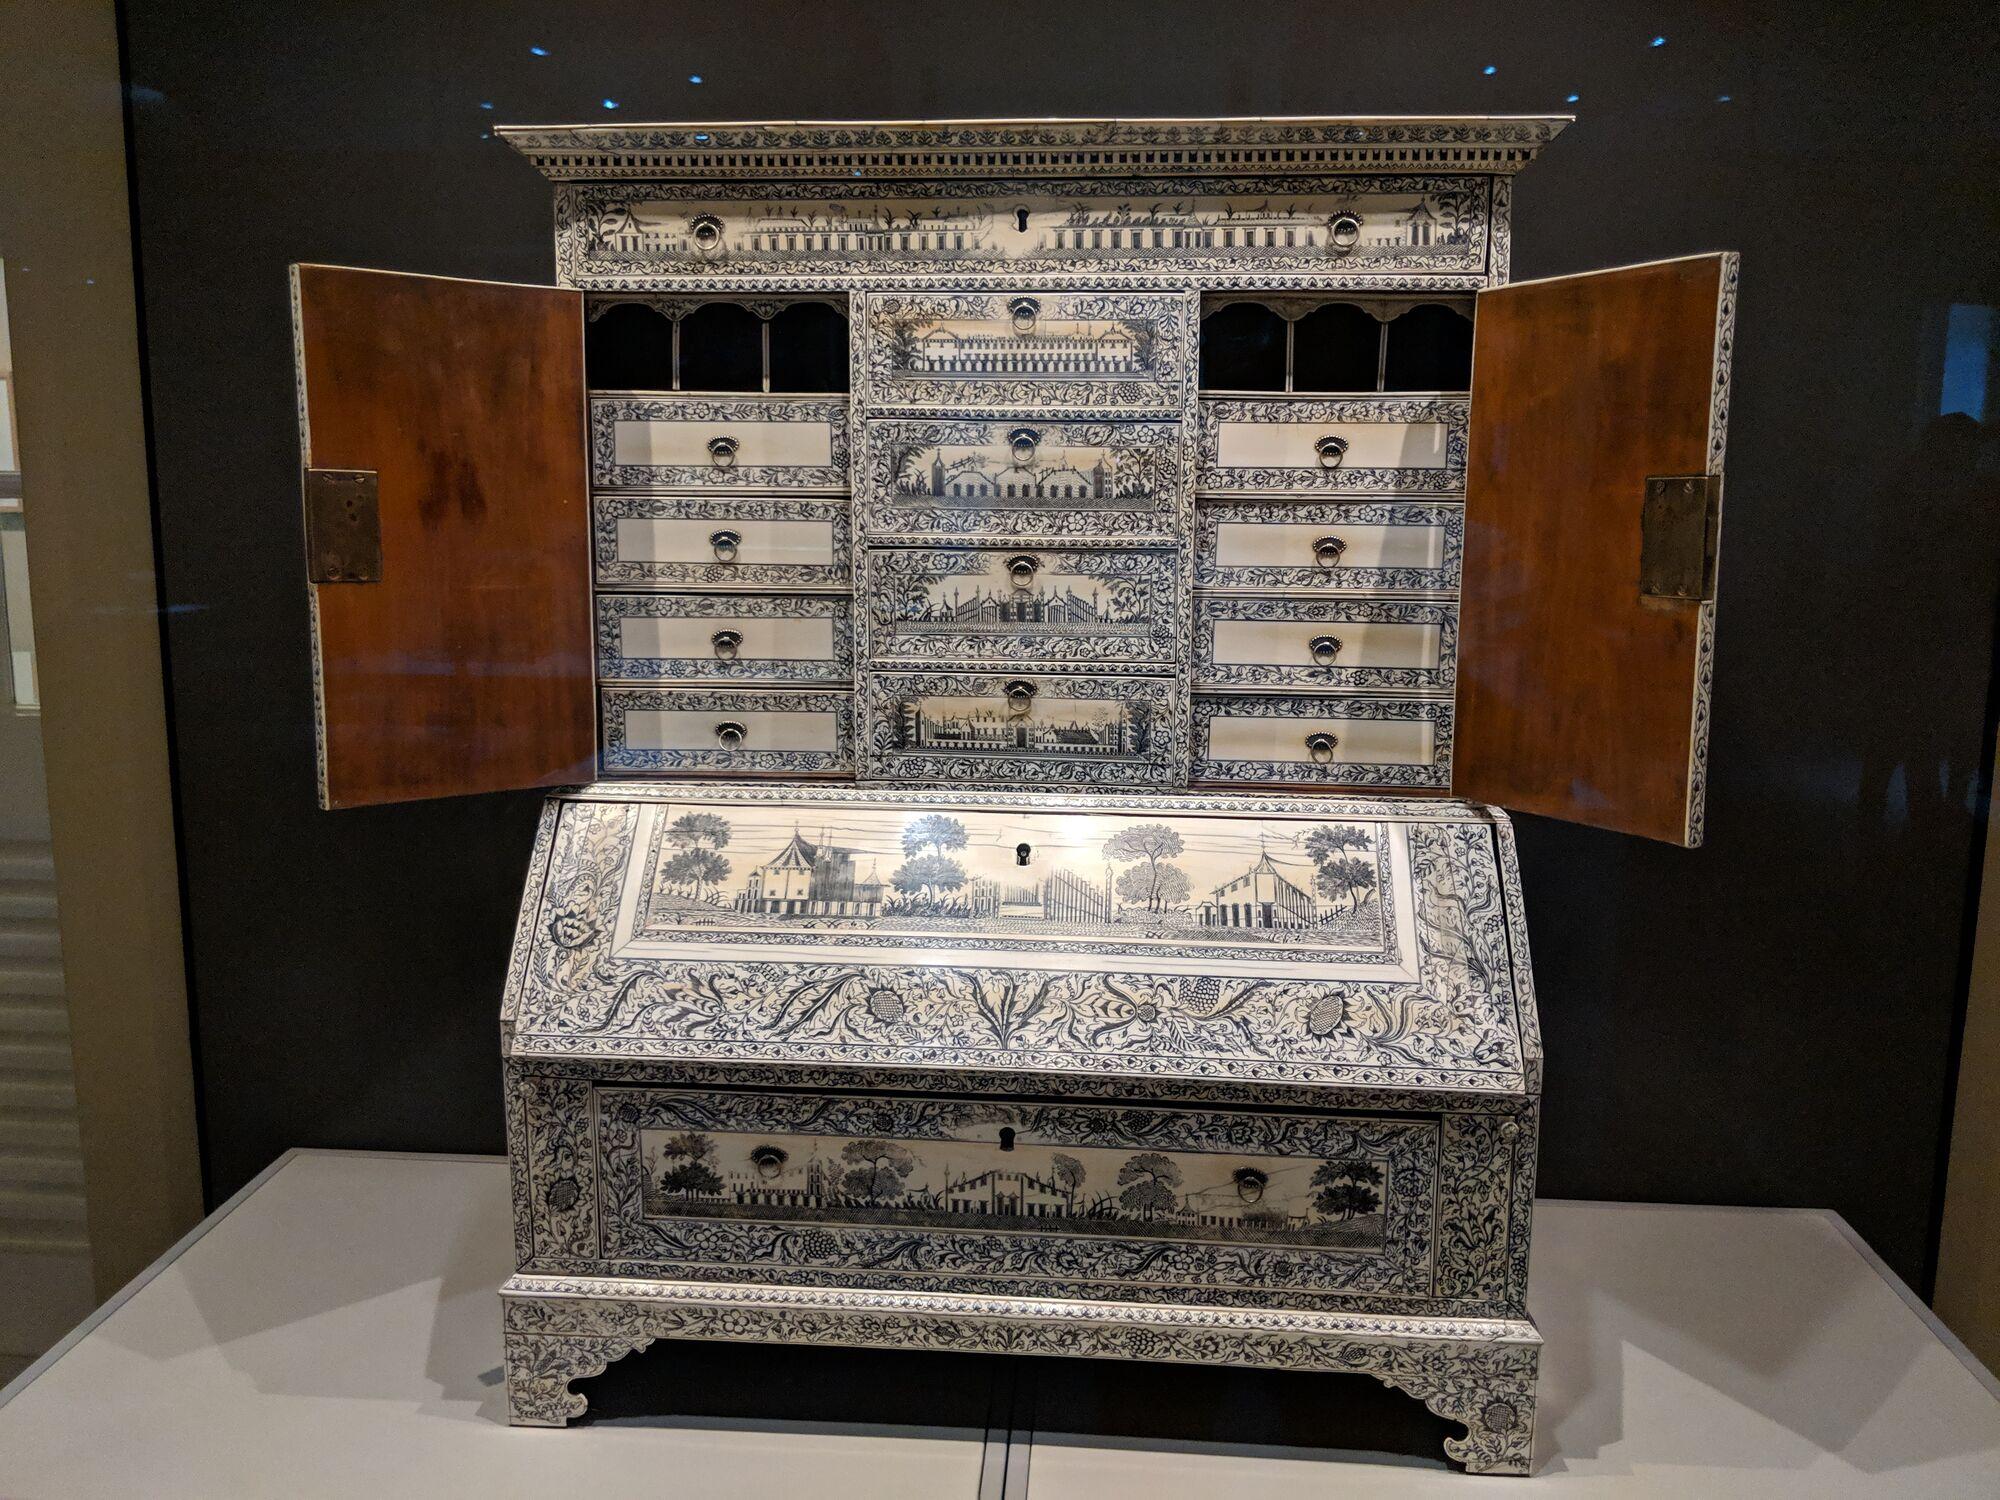 Bureau Cabinet, India, 18th century, Ivory veneered rosewood, lacquer, metal.